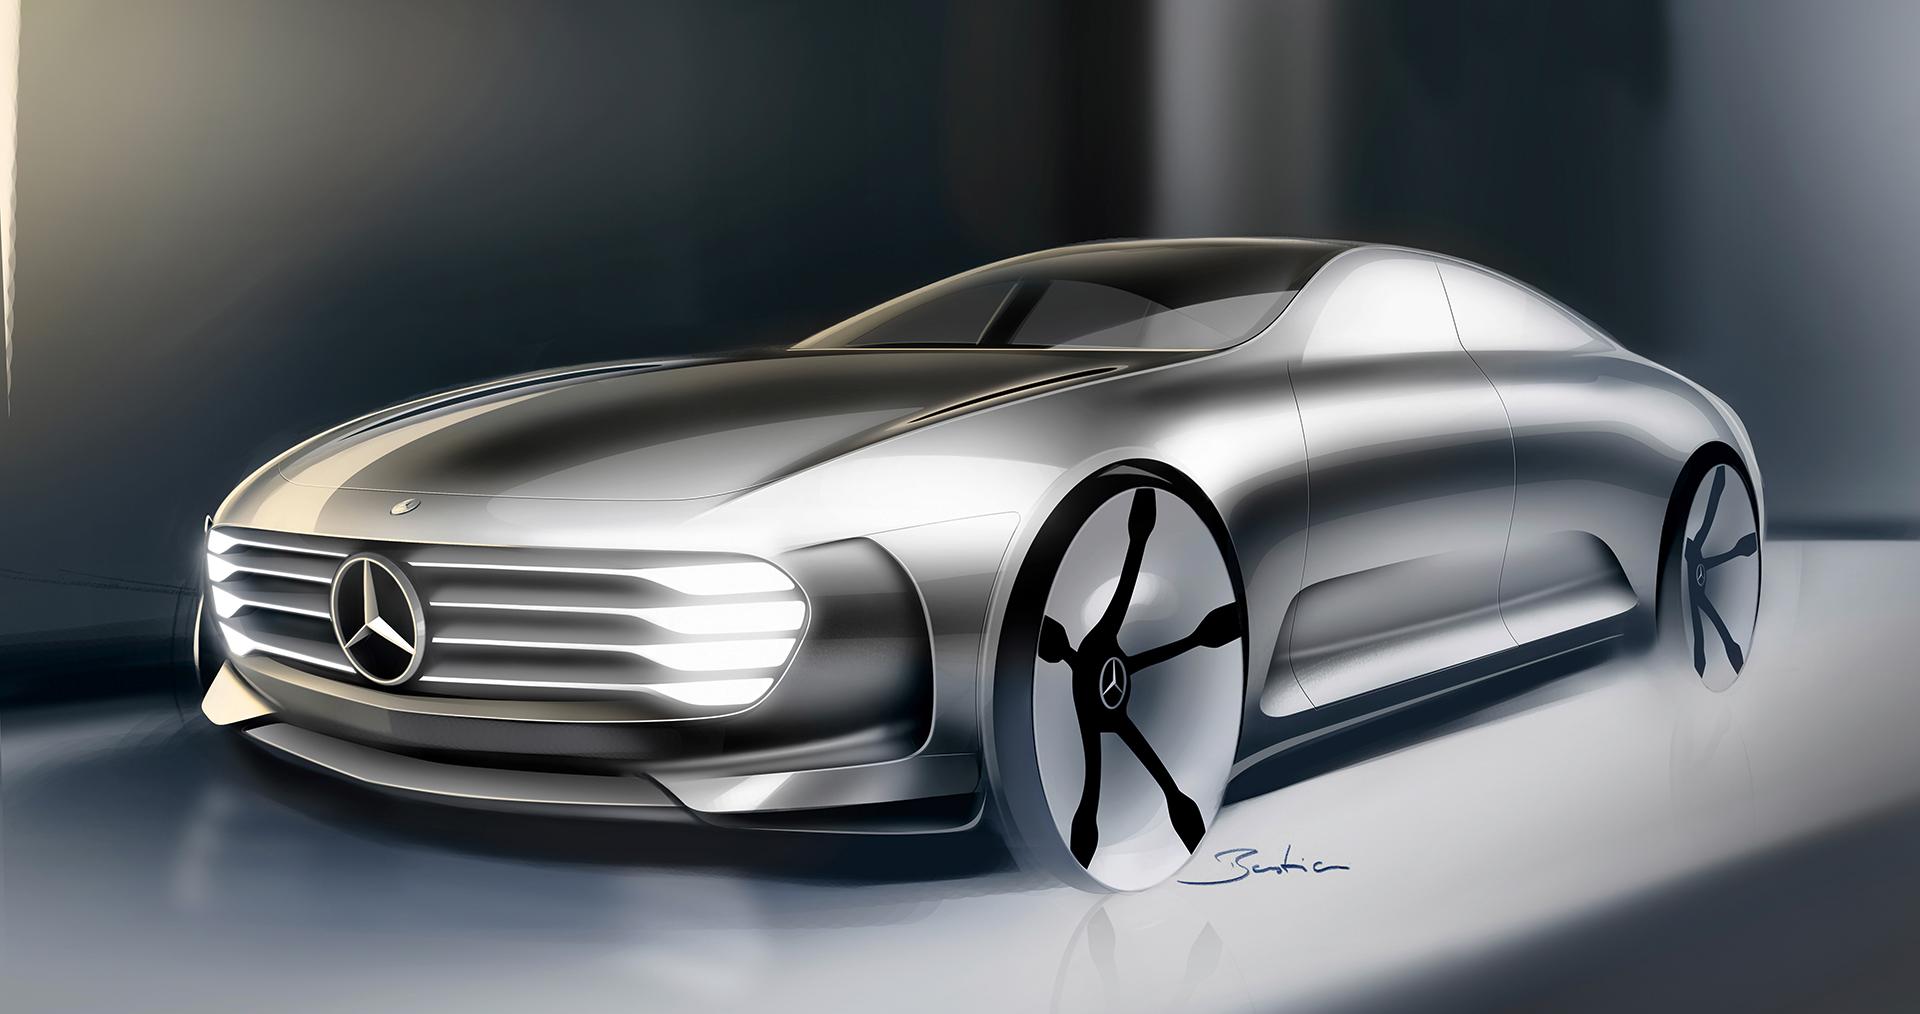 Mercedes-Benz Concept IAA - sketch front design / sketch design avant